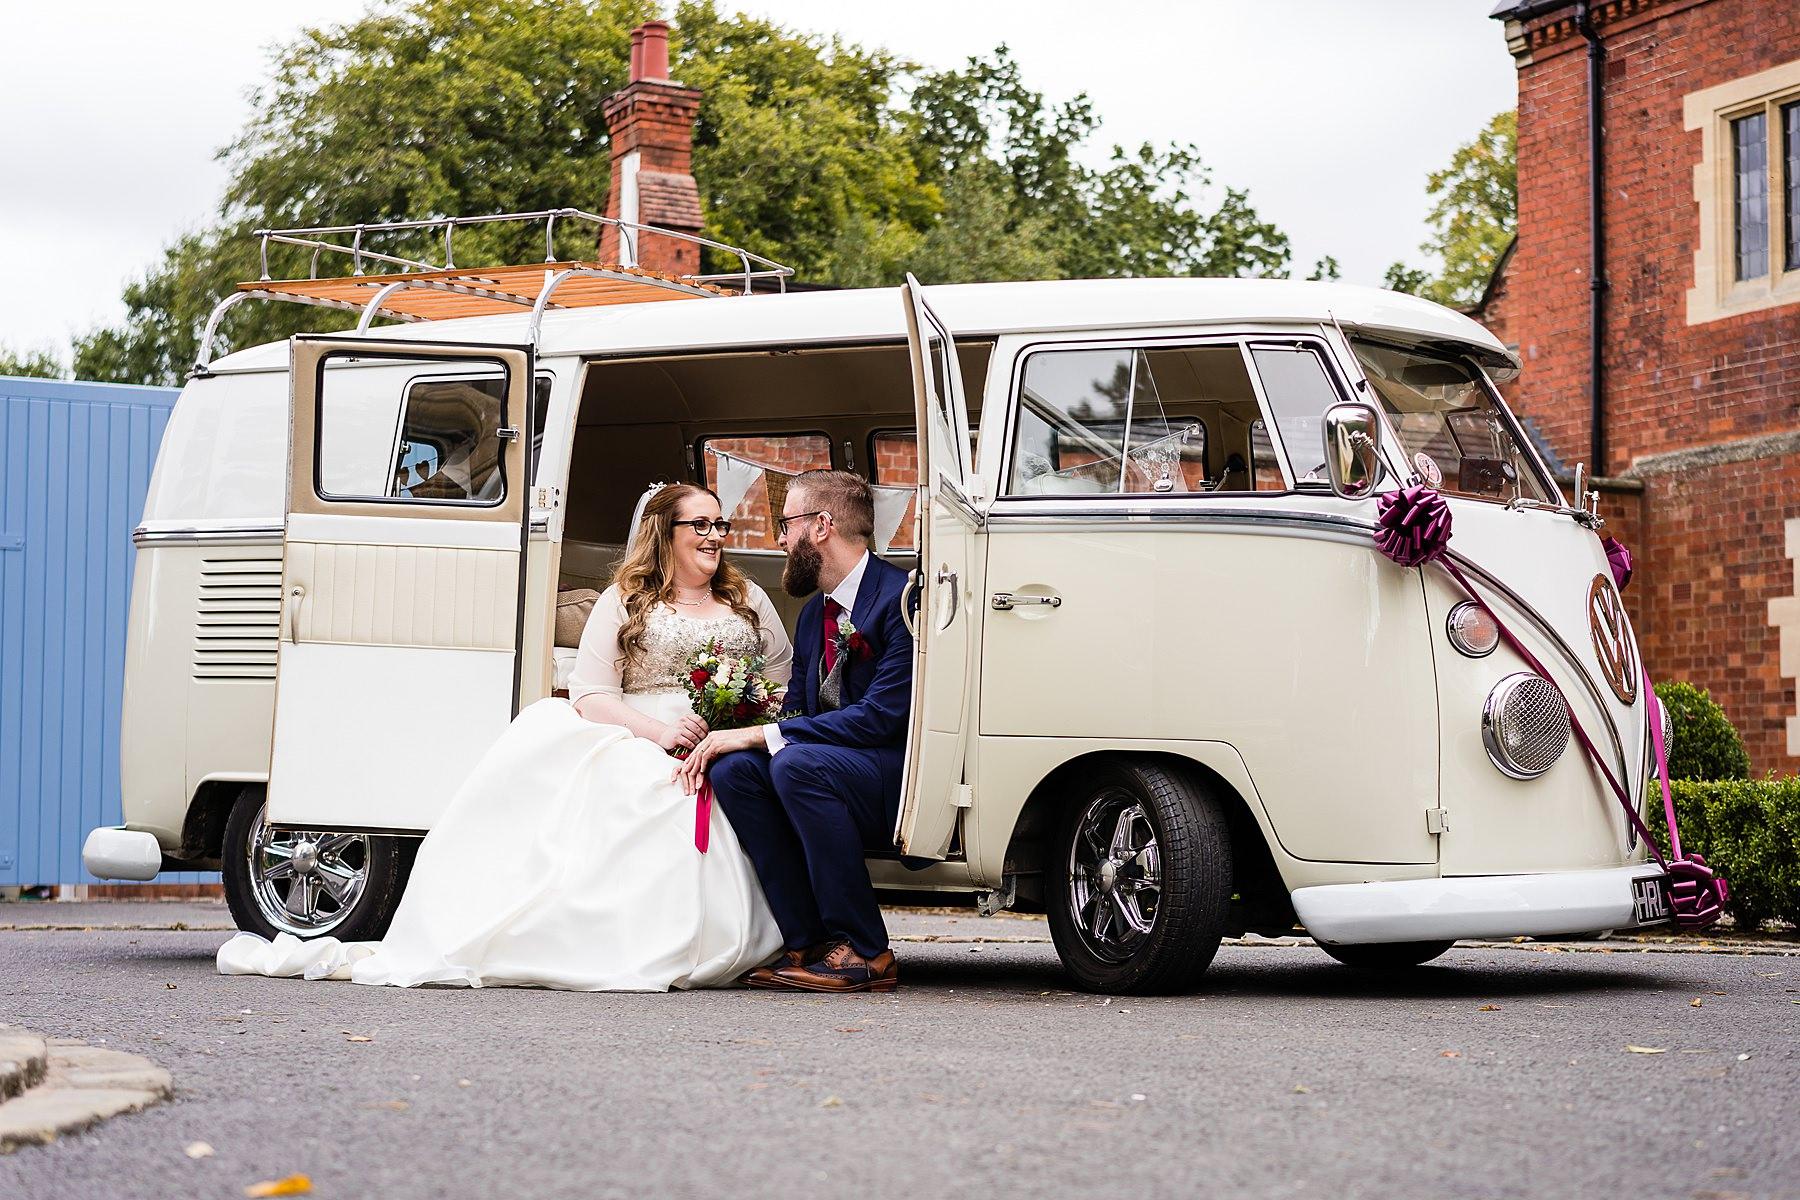 bride and groom portrait with campervan